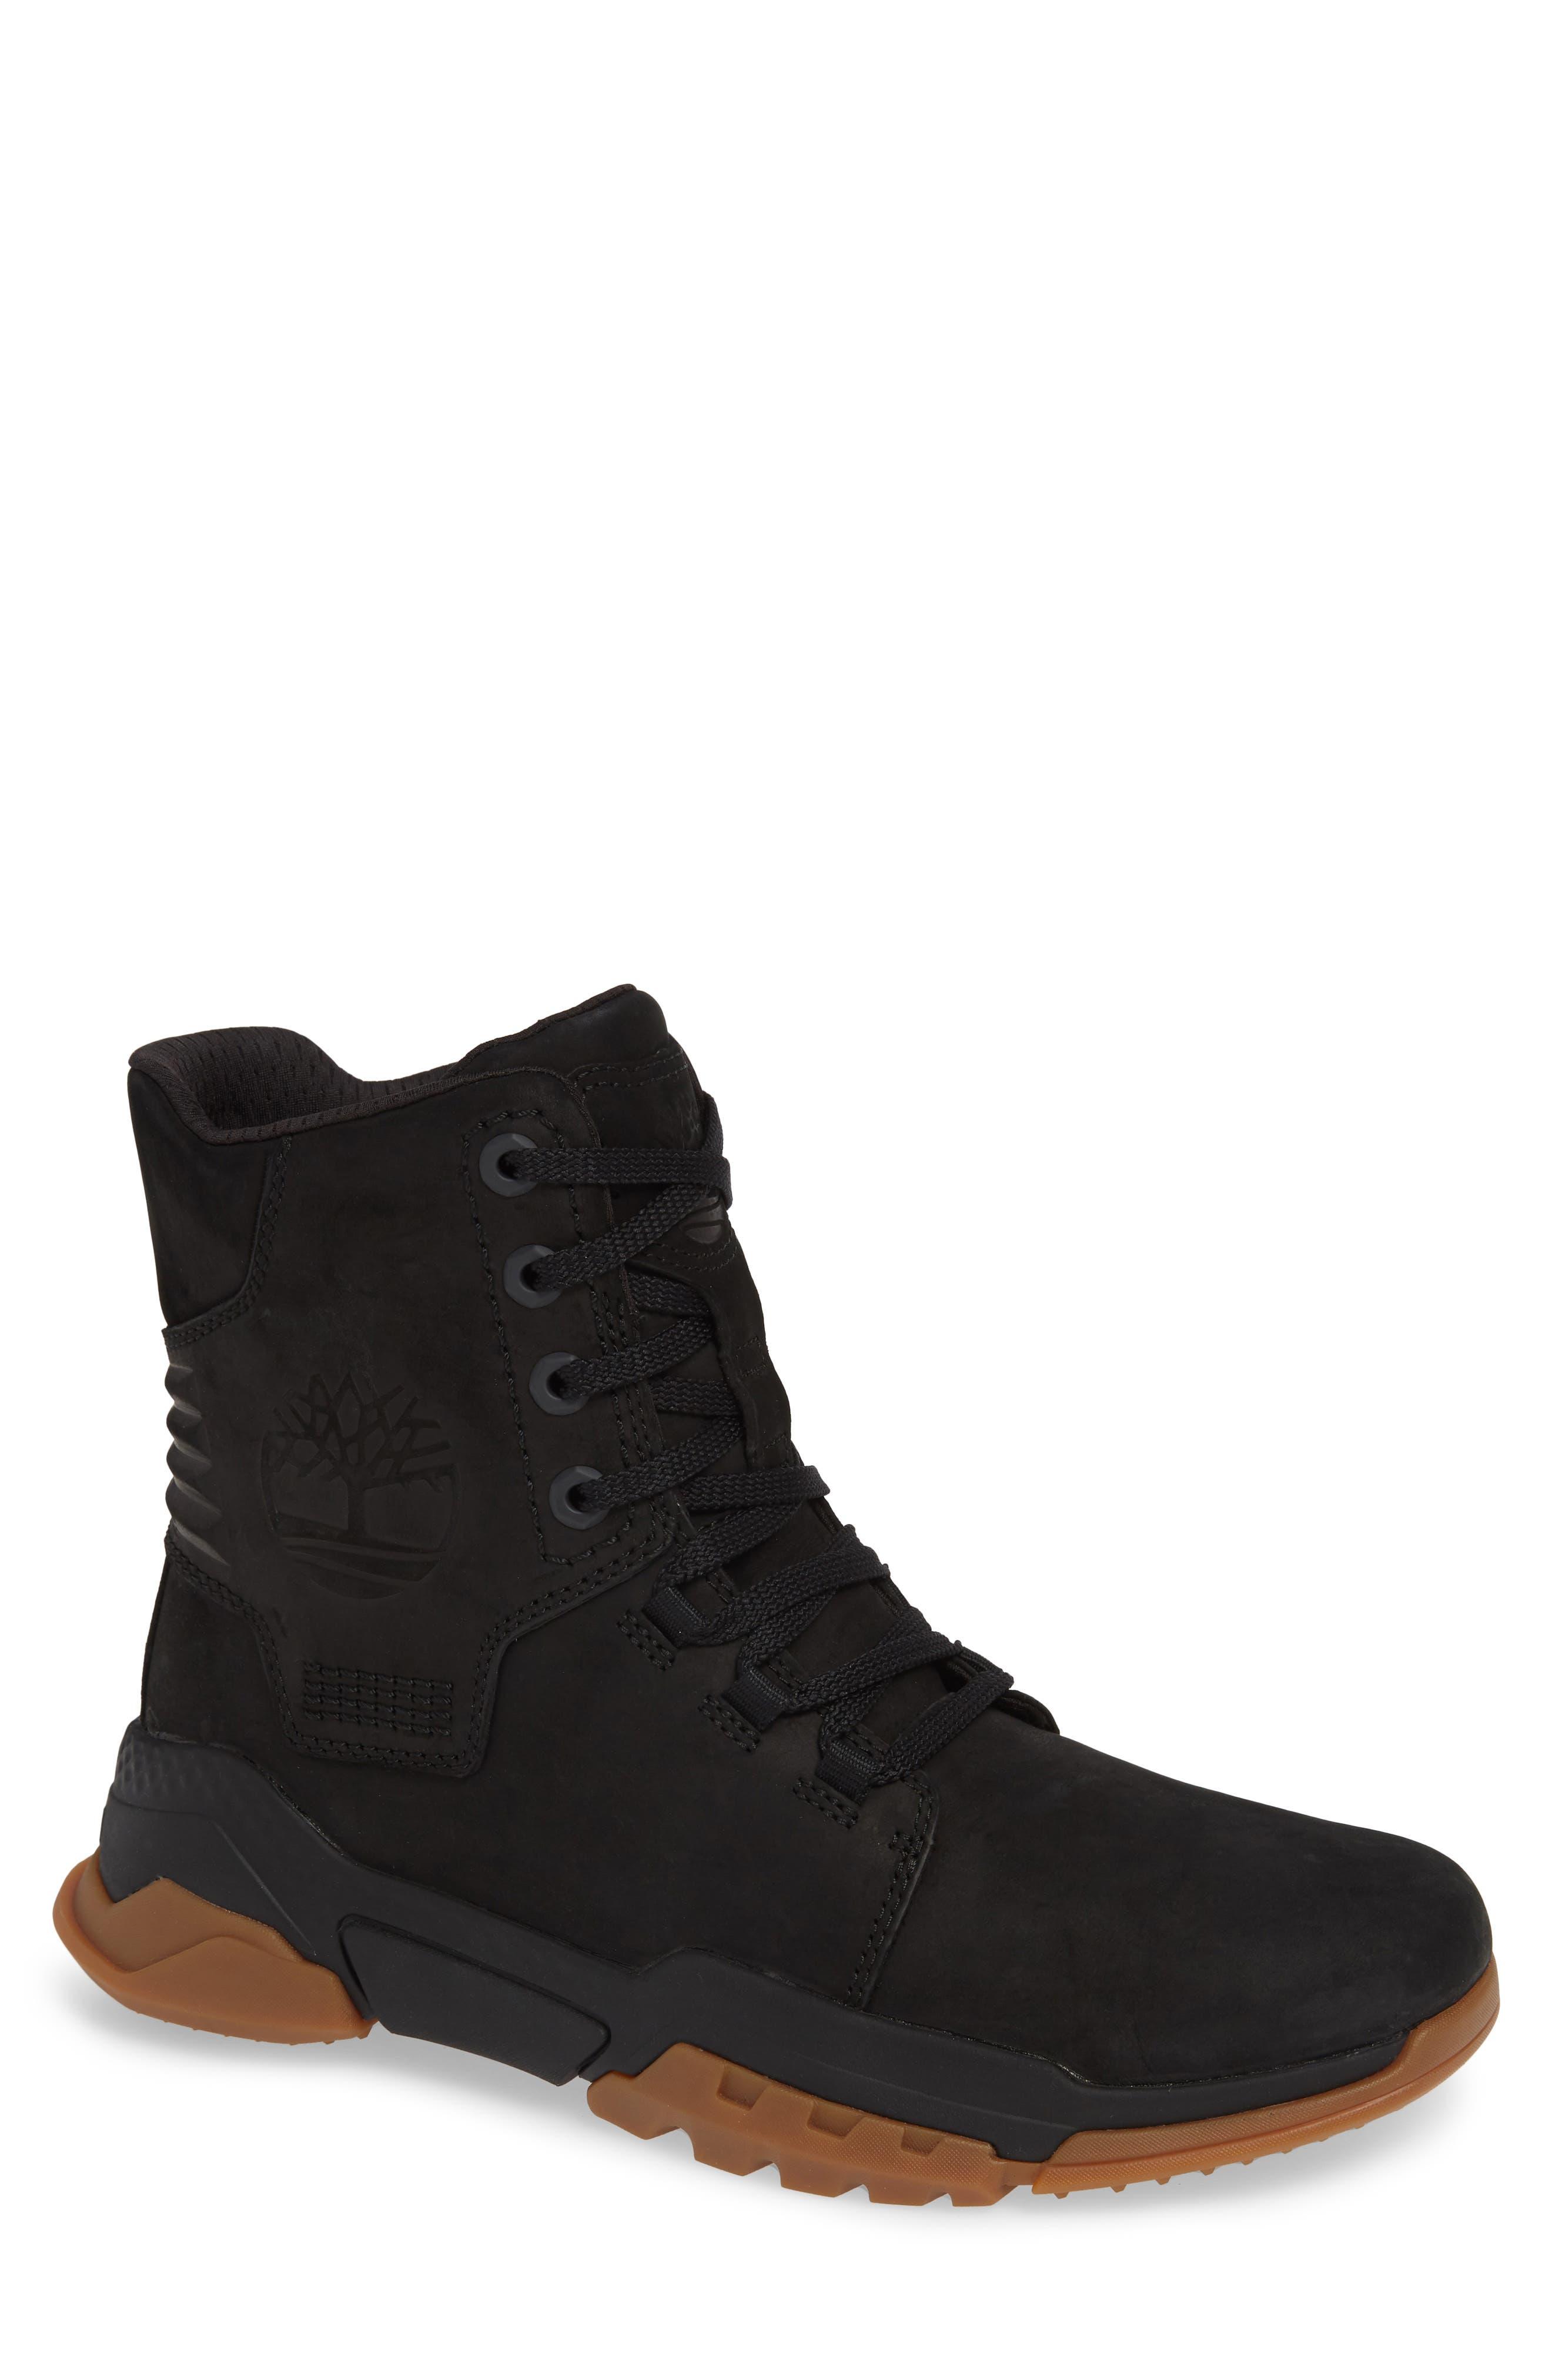 City Force Reveal Plain Toe Boot,                         Main,                         color, BLACK LEATHER/ NEOPRENE